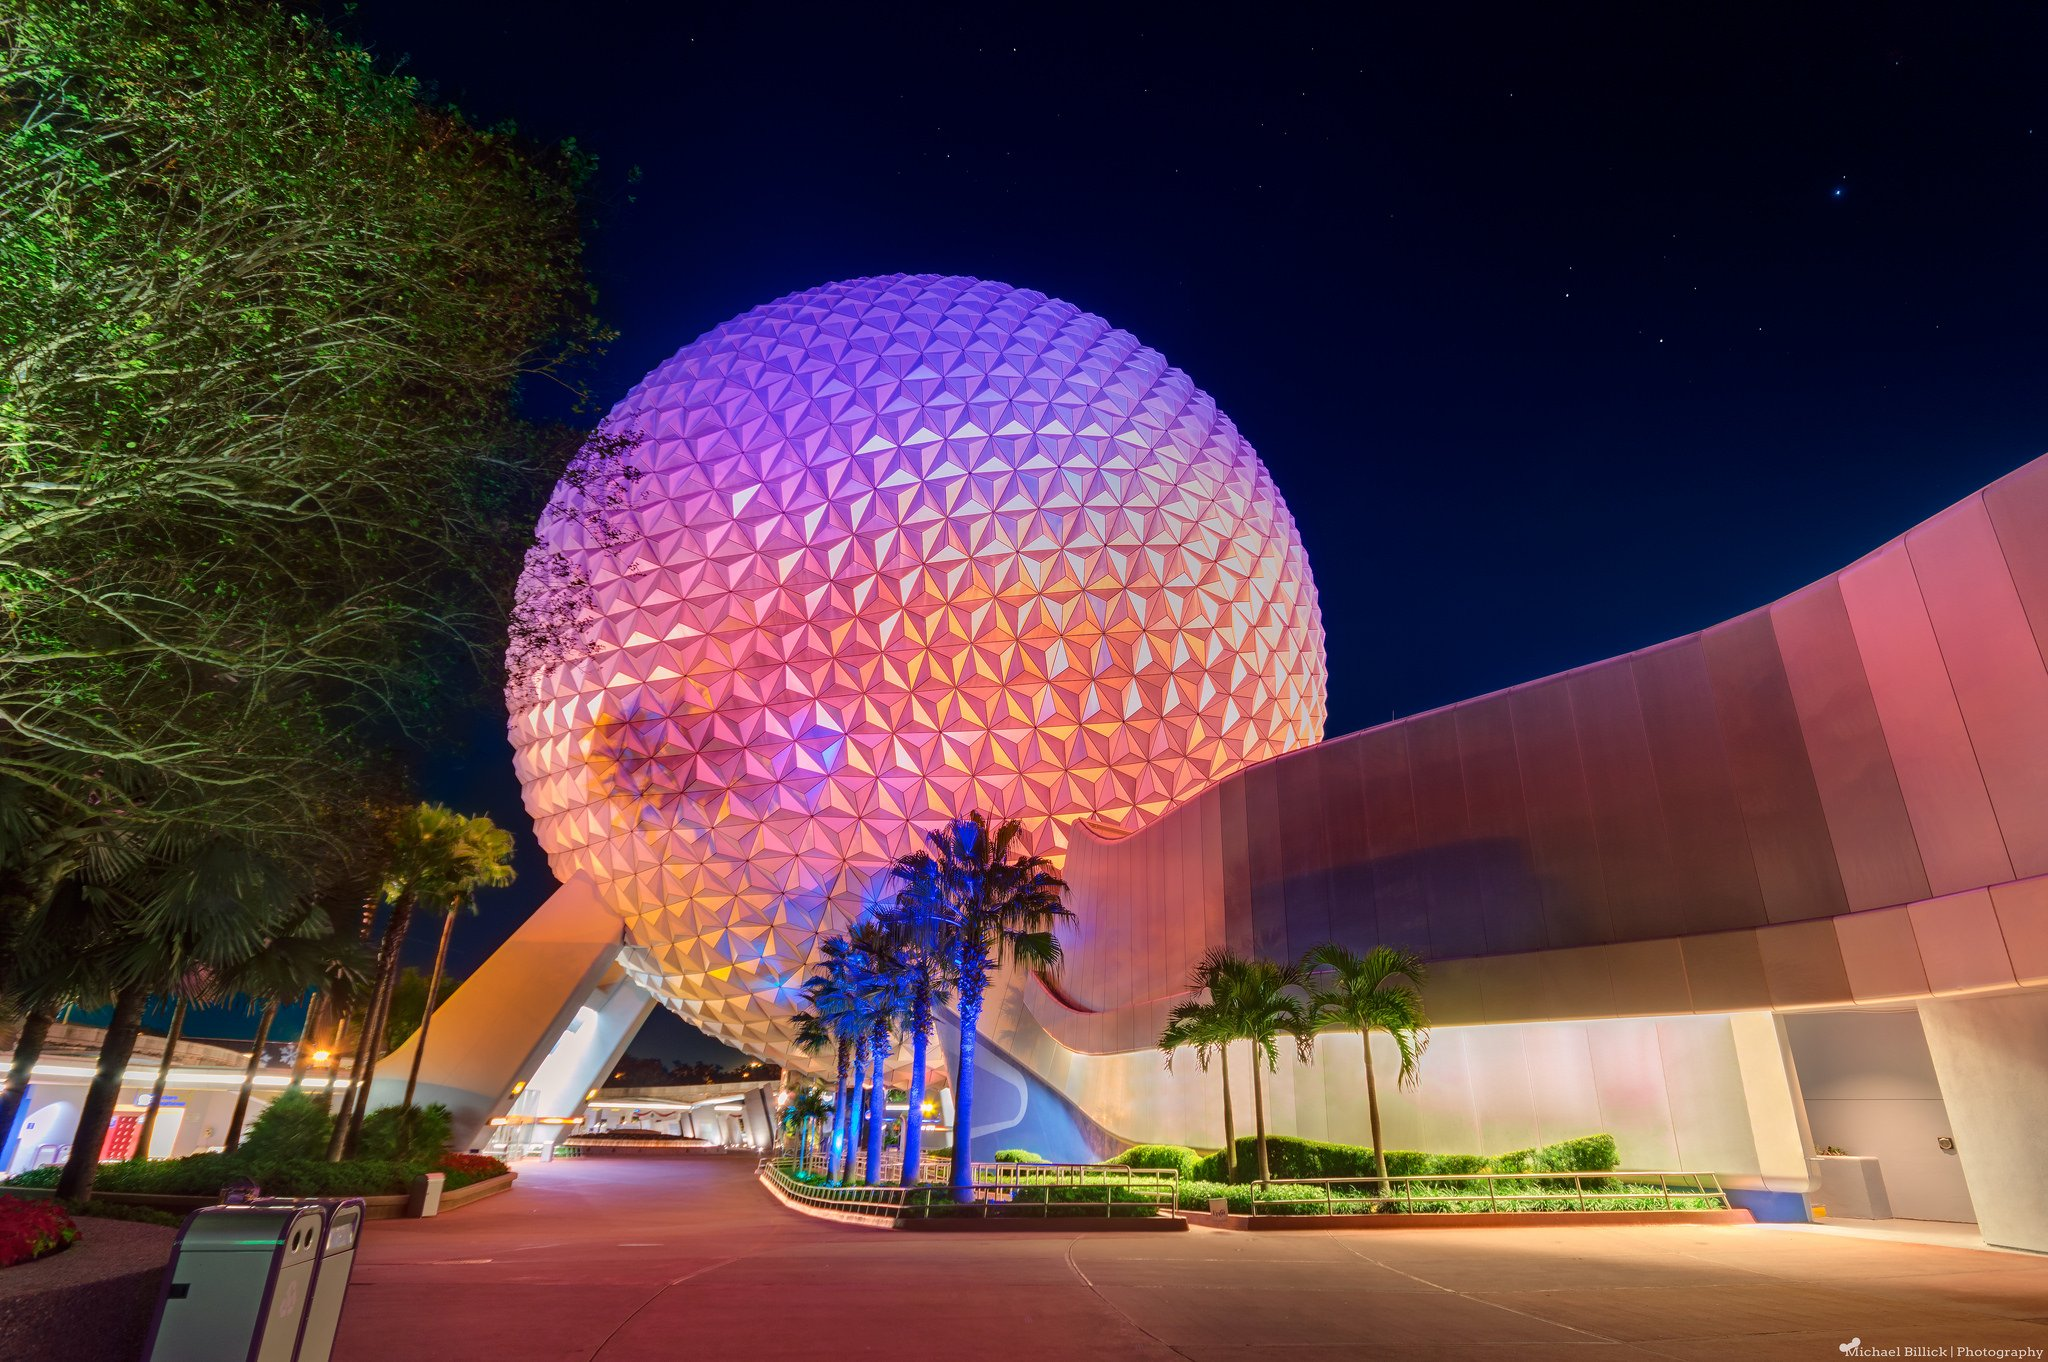 Walt Disney World Resort Orlando Floride Florida USA Universal Studio Castel Hotel Mickey Night Light Stores Entertainment Parc Childrens Offices